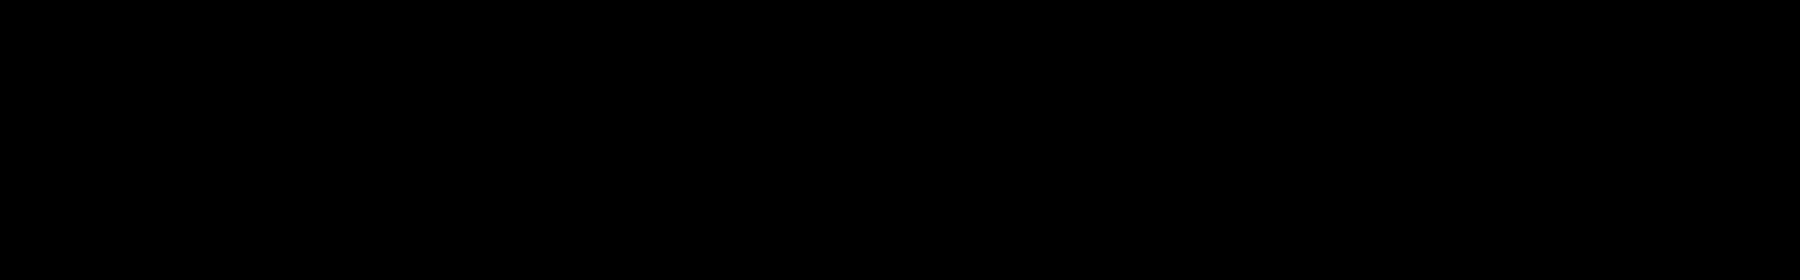 Chilltone audio waveform